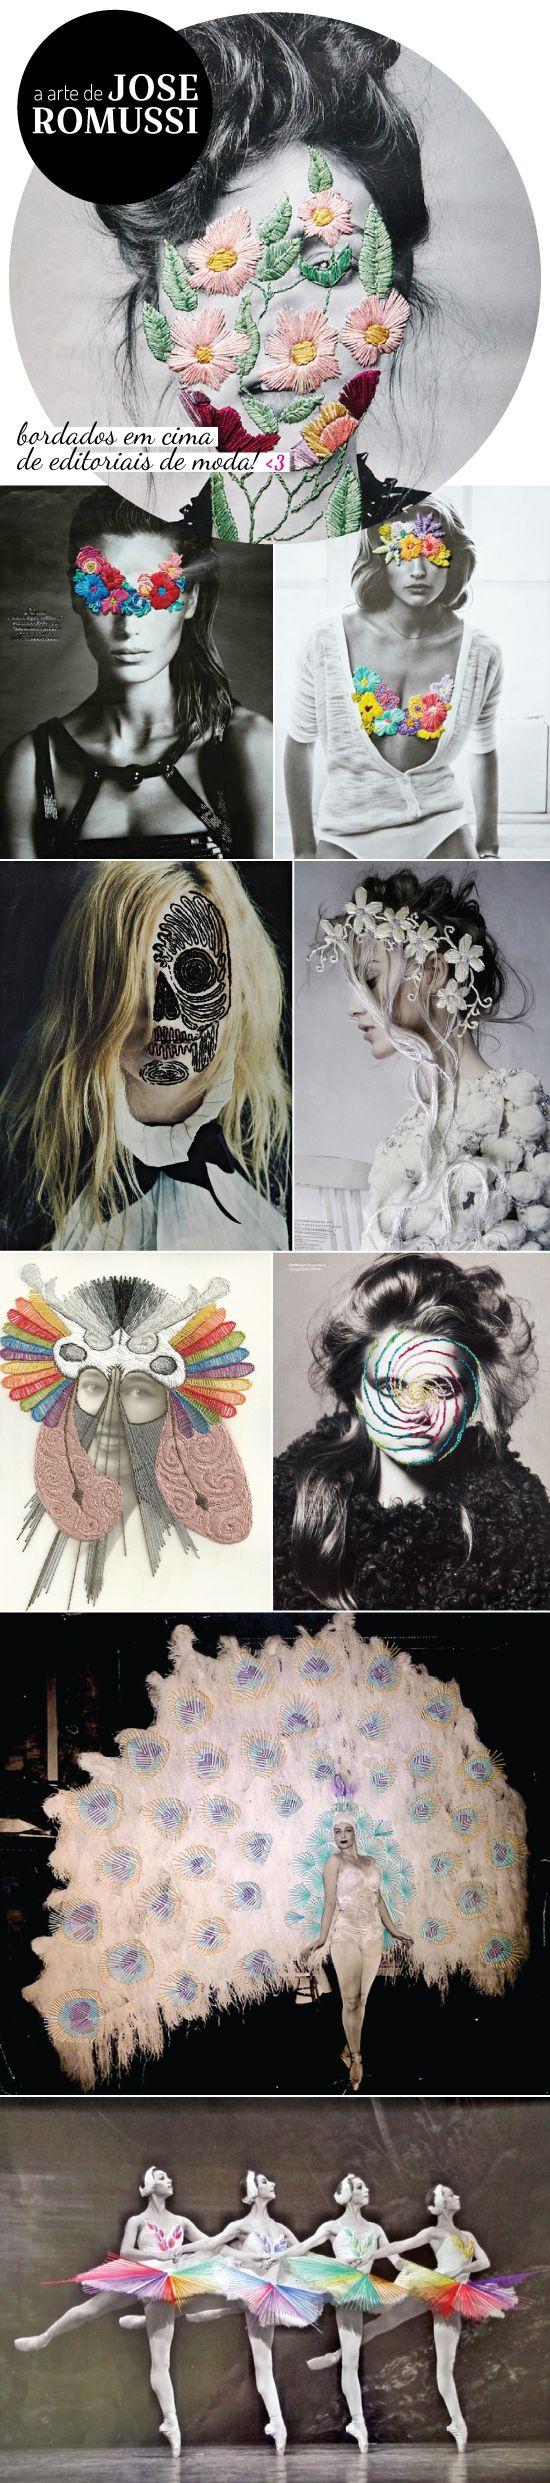 jose-romussi-arte-art-bordado-editorial-fashion-moda-dance-danca-em-embroidery